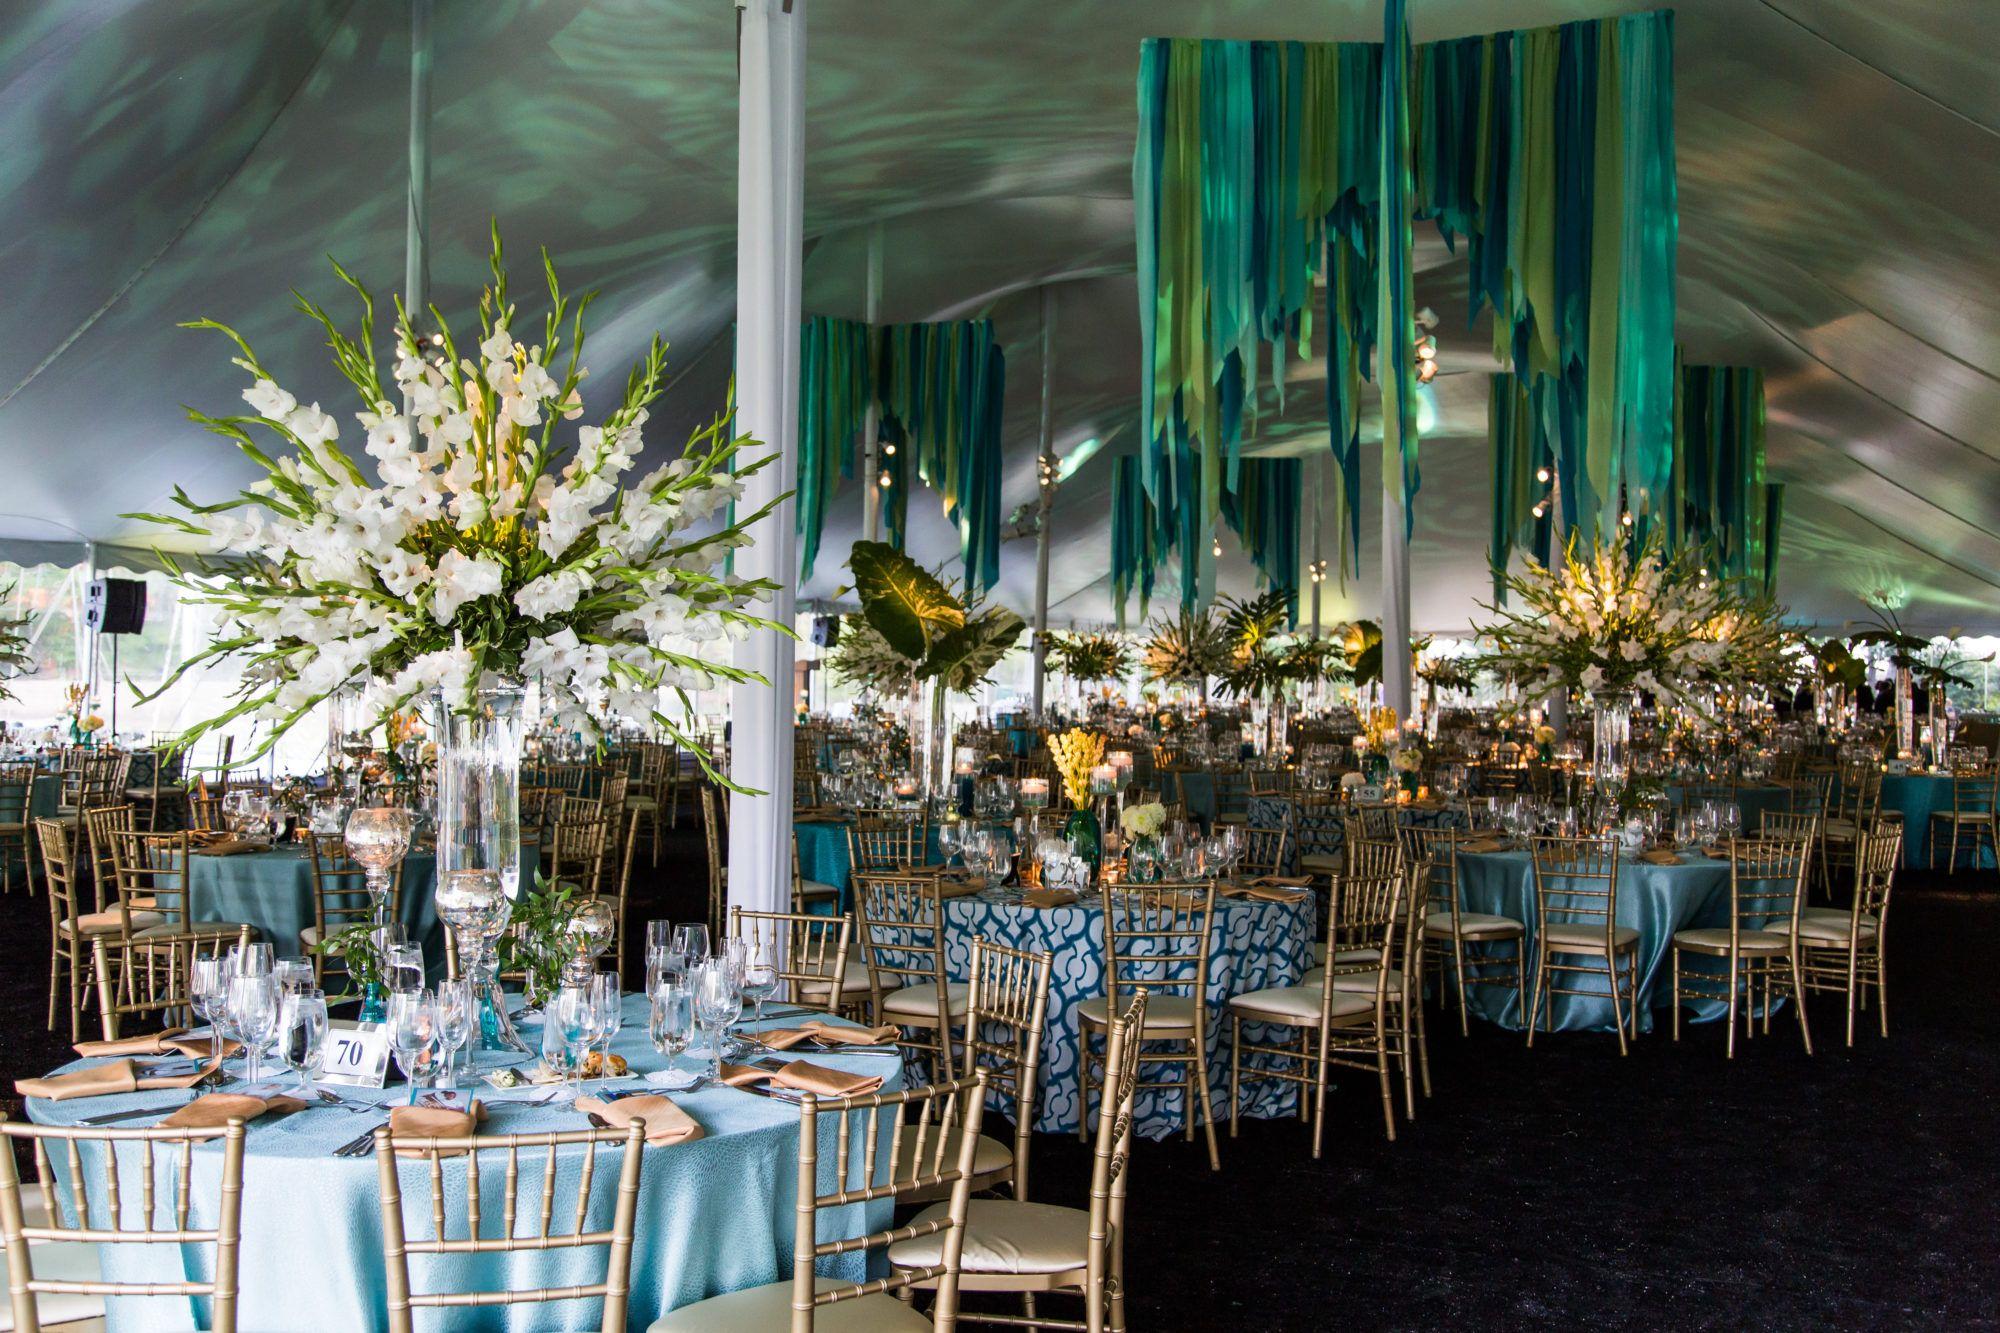 Wedding background latest  eventcreative chicagoevents customevents blue green